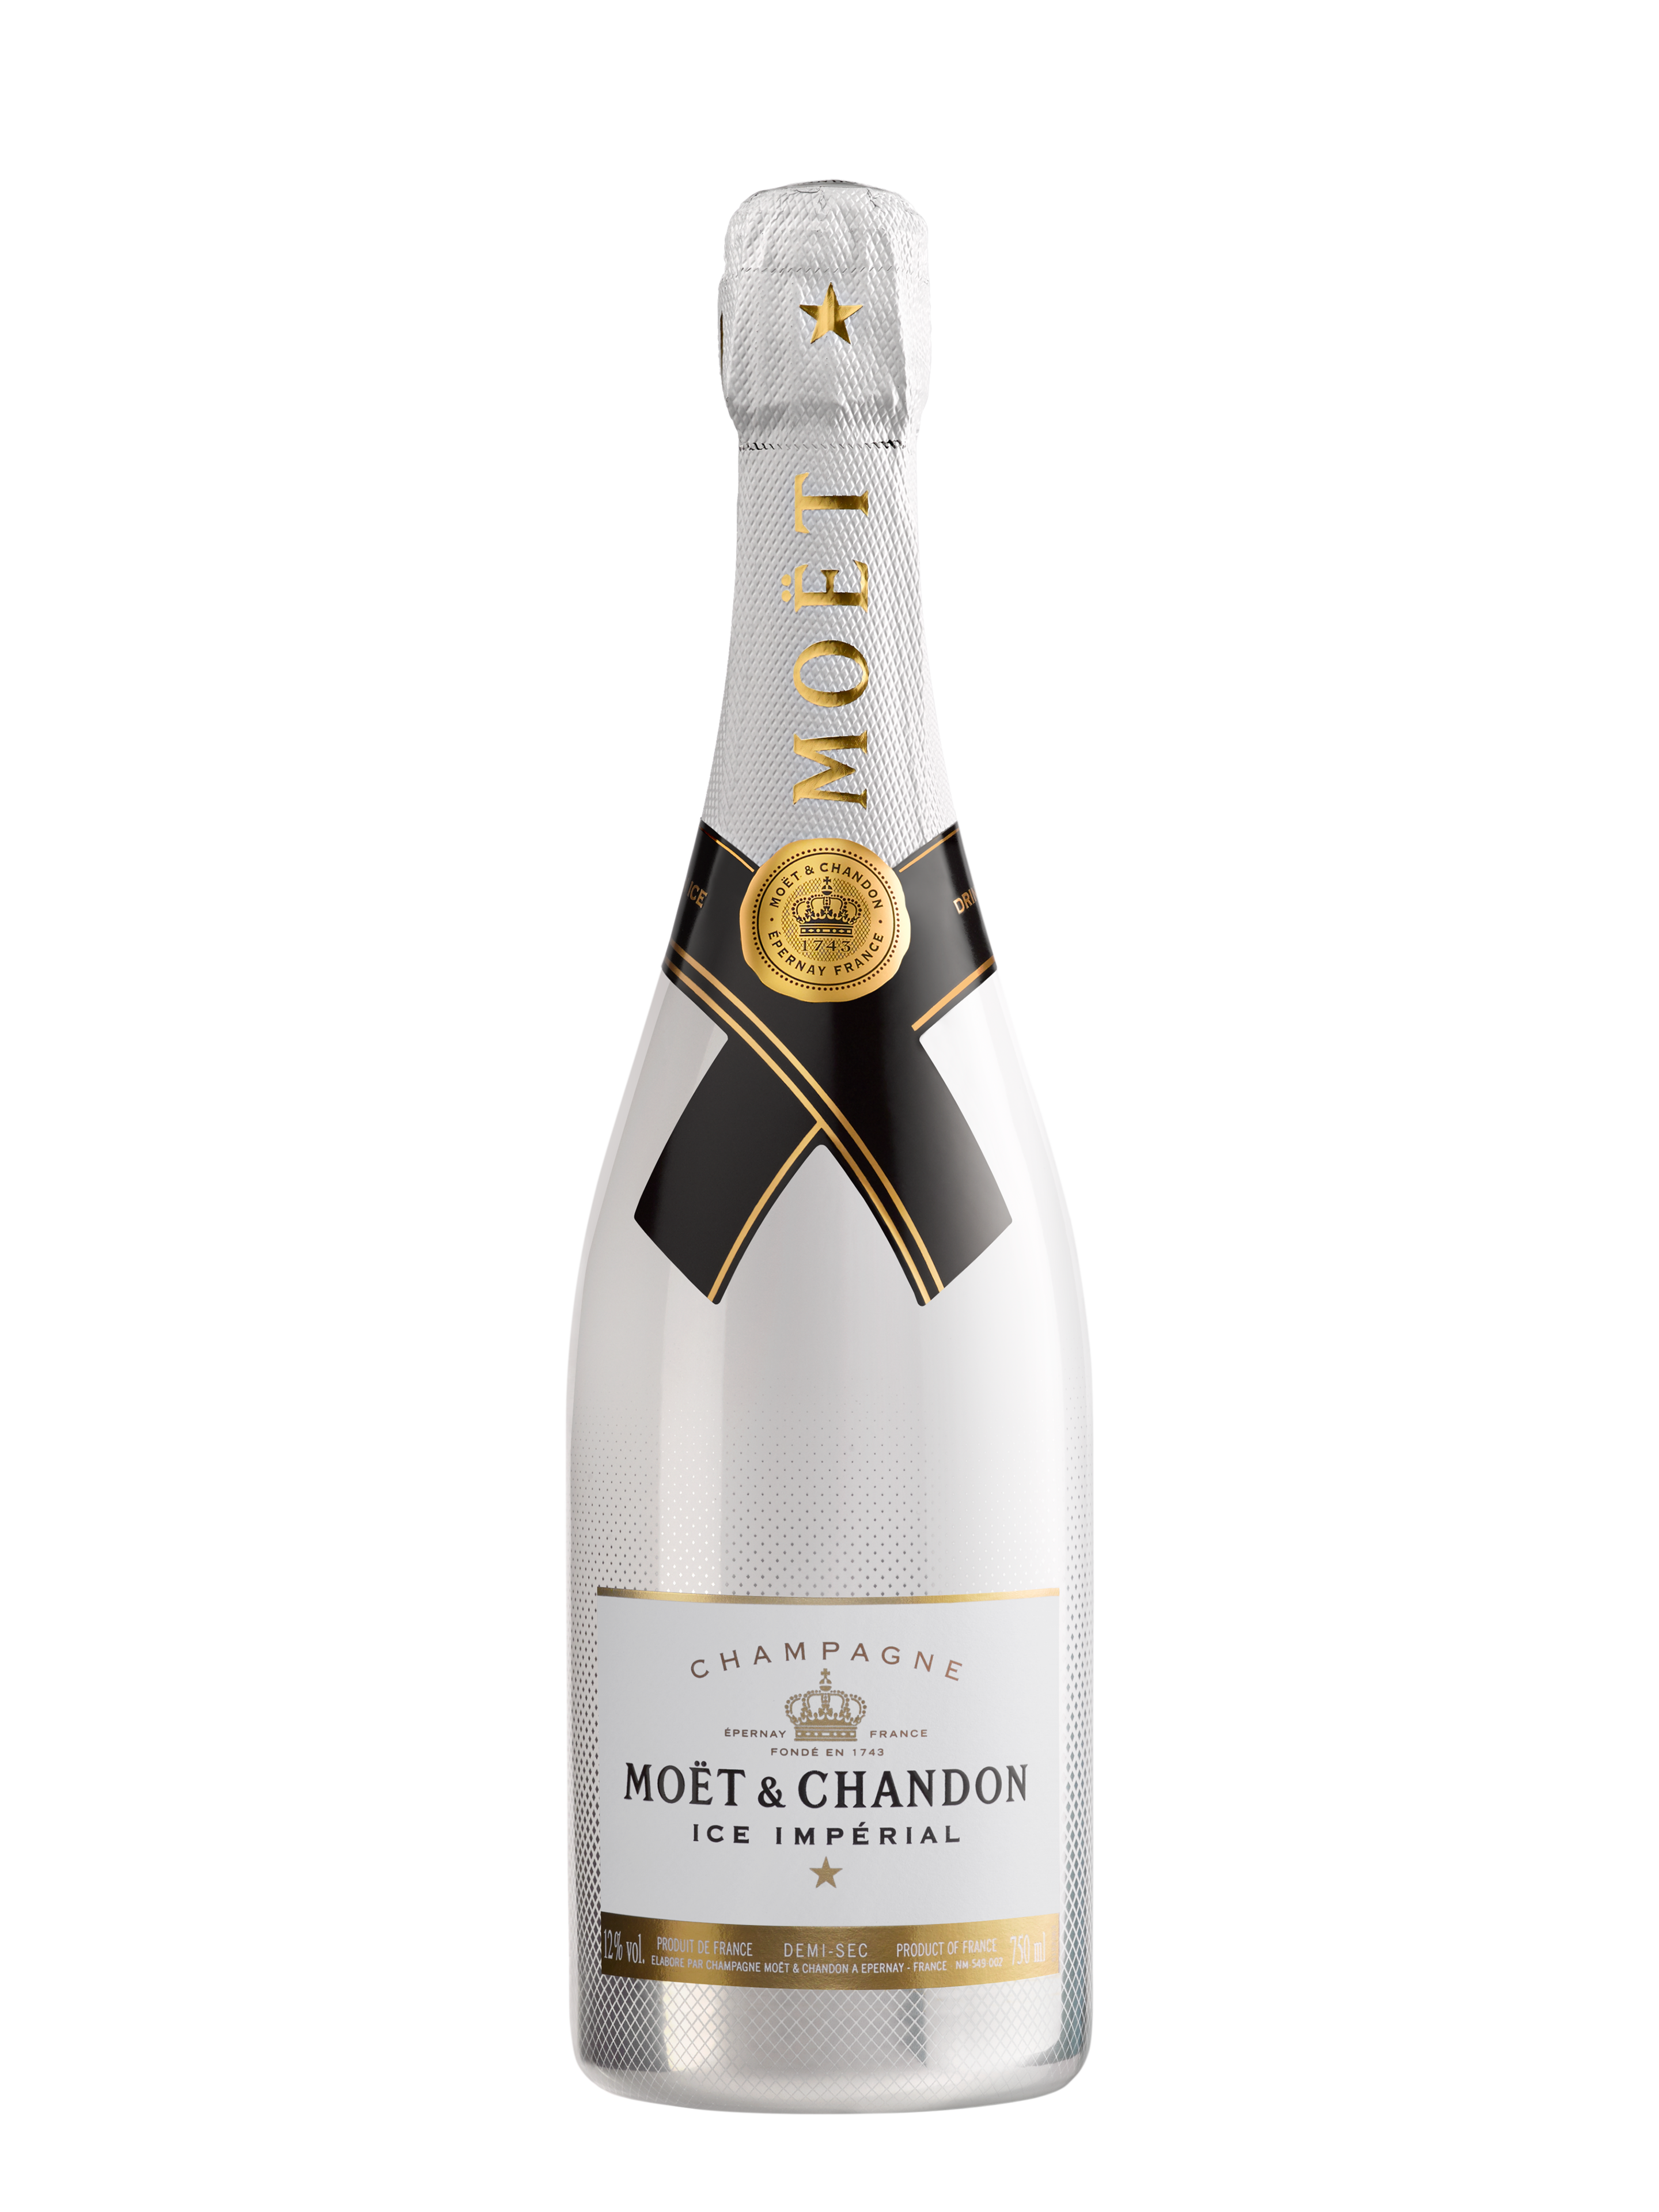 Mo t chandon champagne. Moet bottle png